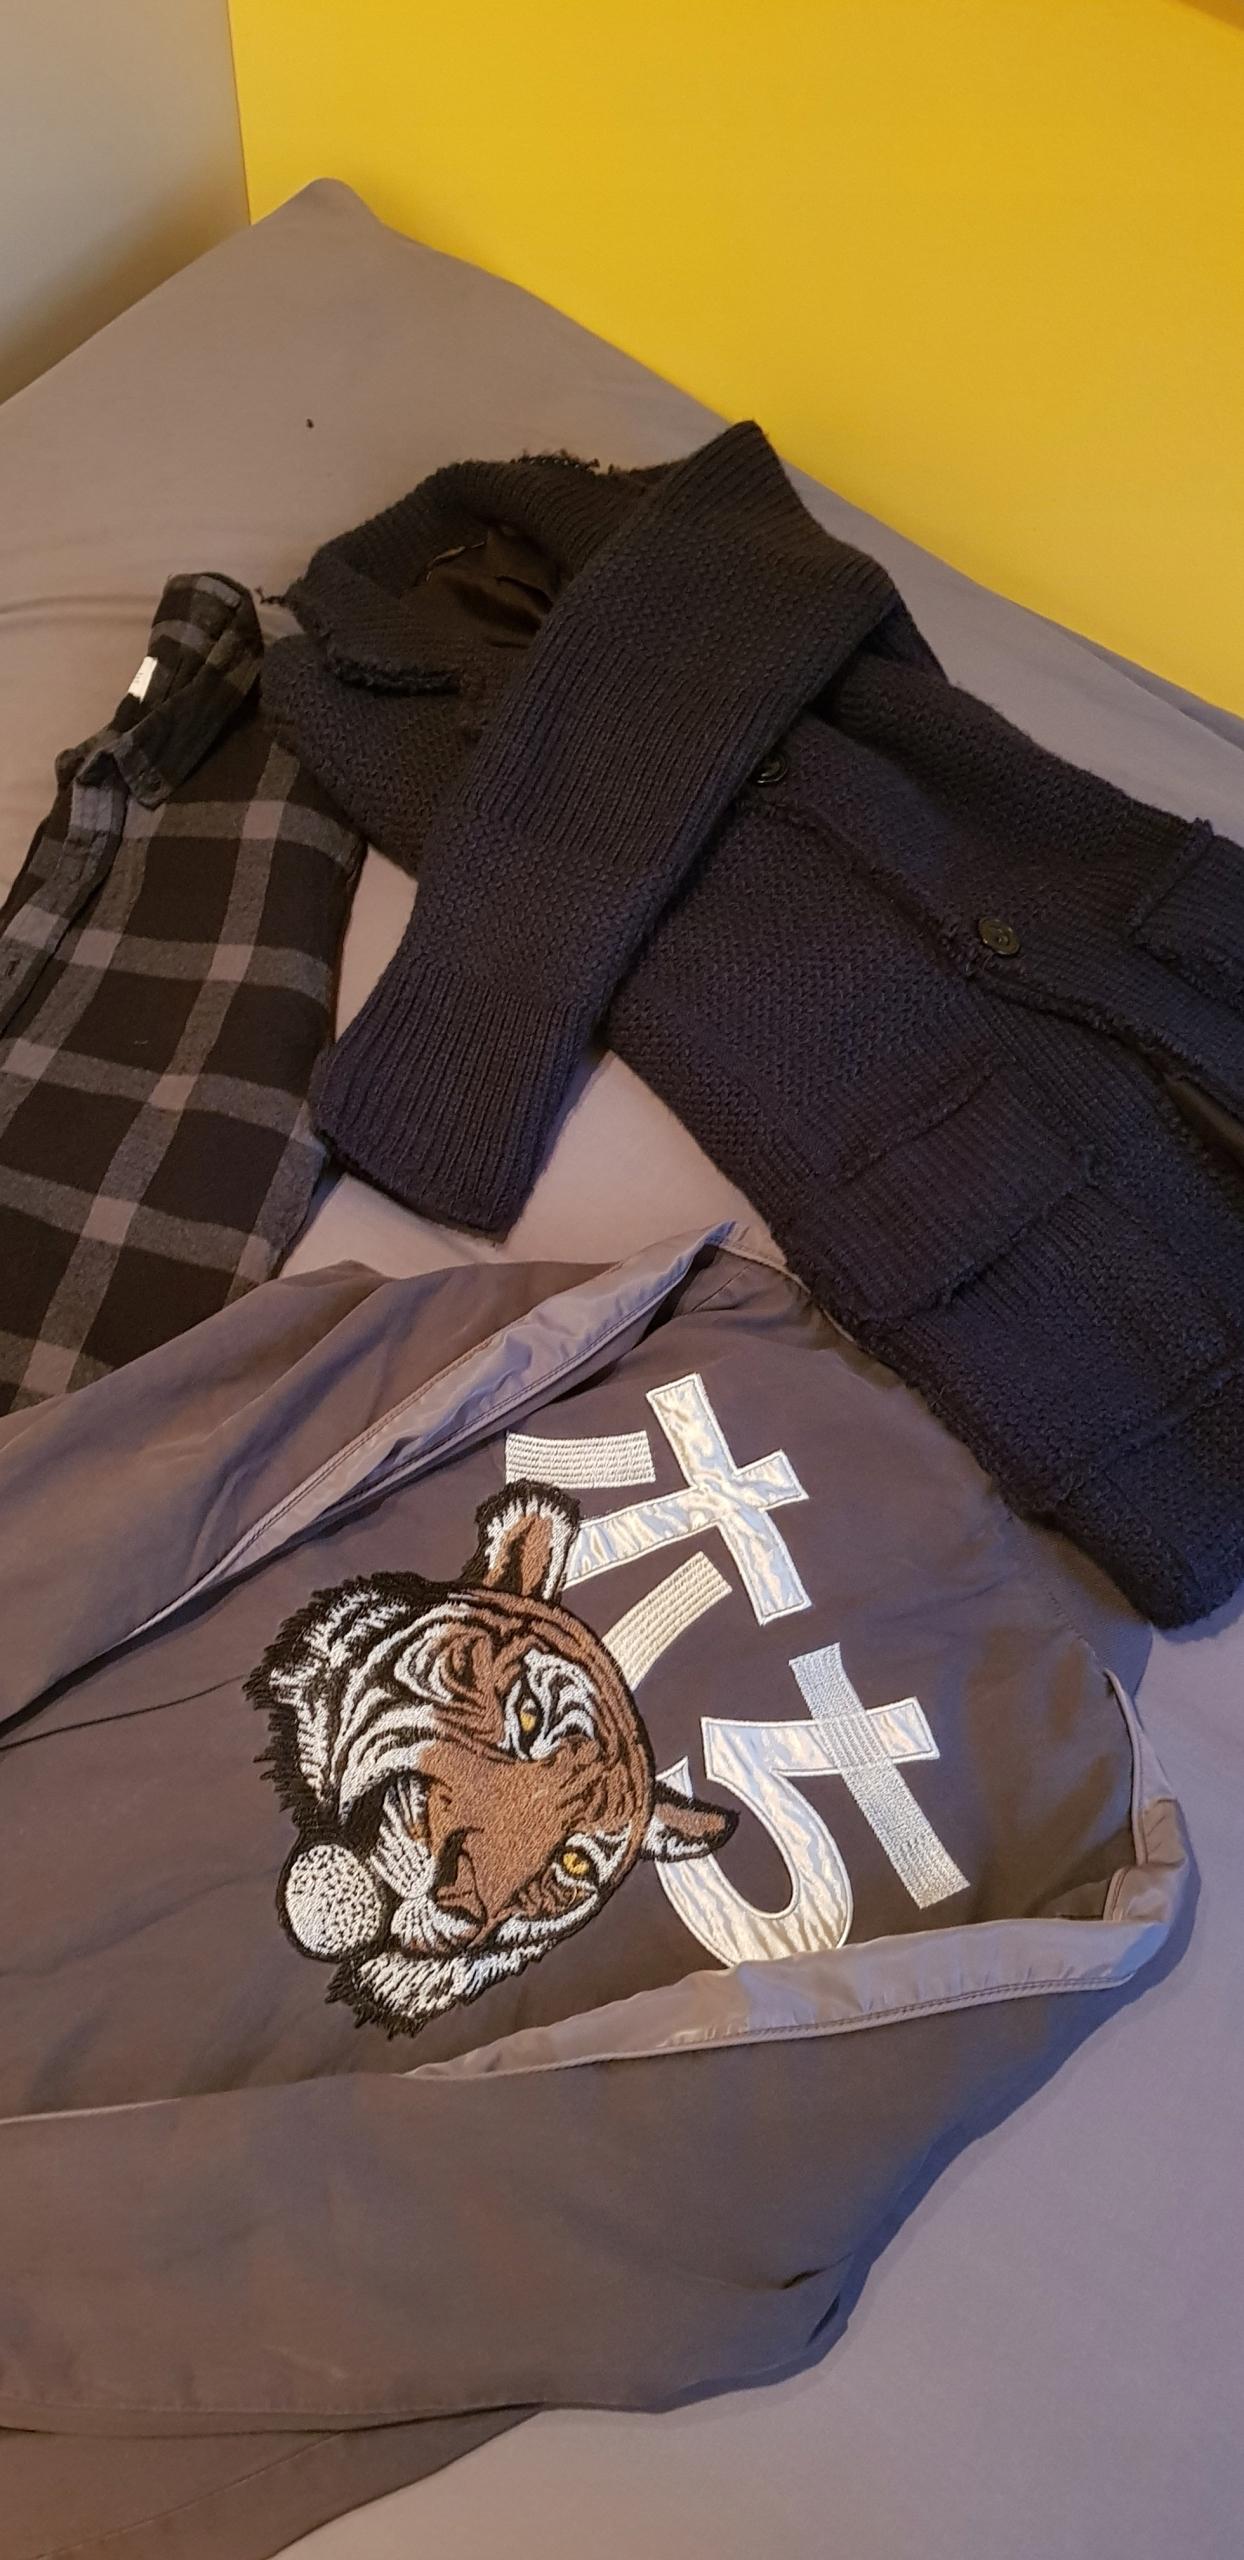 MEGA PAKA MĘSKICH UBRAŃ S/M-Zara,H&M, Bershka!